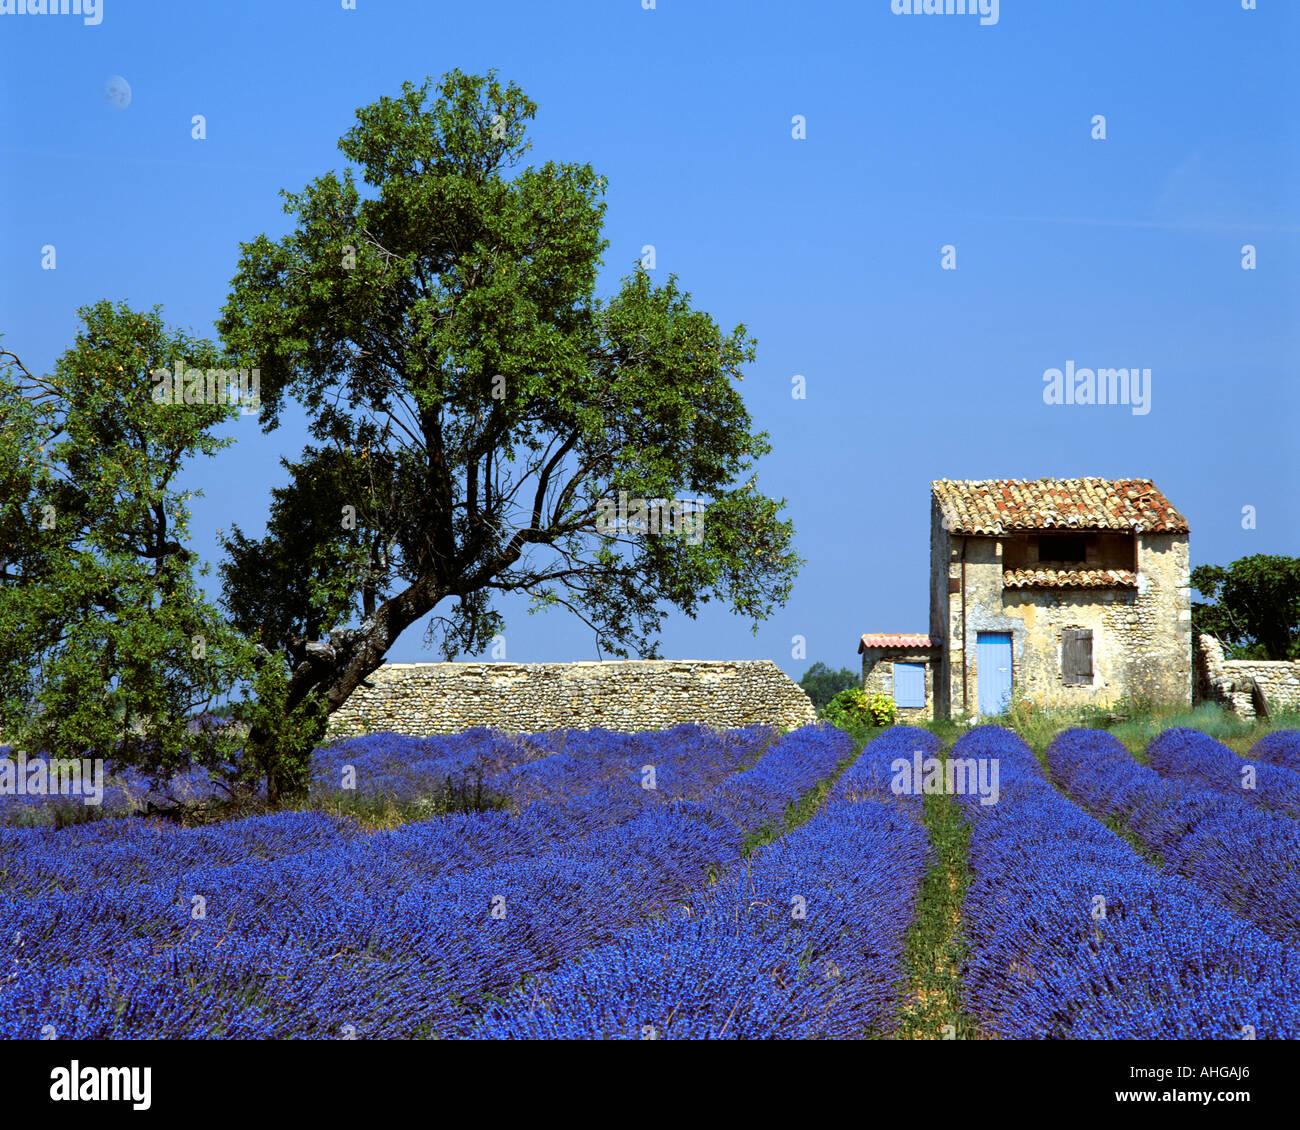 FR - ALPES-DE-HAUTE-PROVENCE: Lavendelfeld und Baum auf Plateau de Valensole in der Nähe von Puimoisson Stockbild